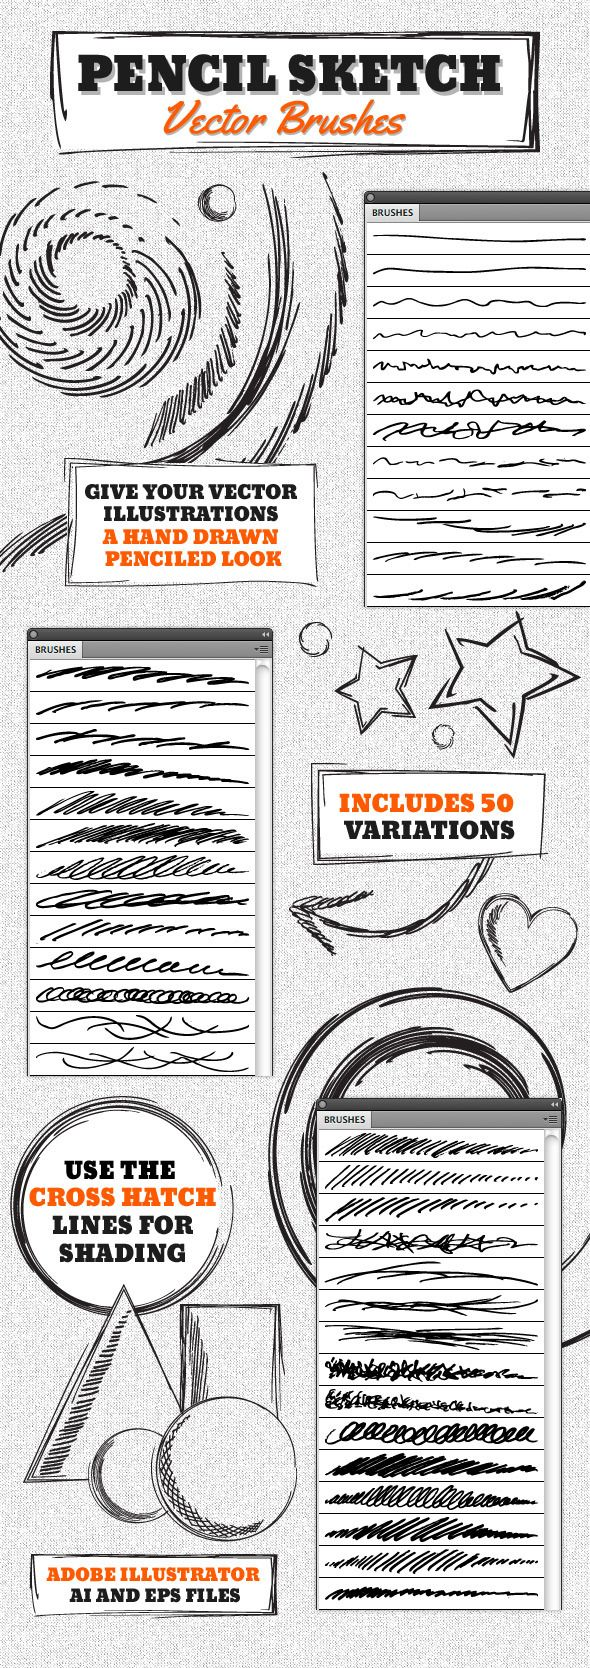 Vector Pencil Sketch Brushes for Adobe Illustrator #design #ai Download: http://graphicriver.net/item/vector-pencil-sketch-brushes/4630510?ref=ksioks